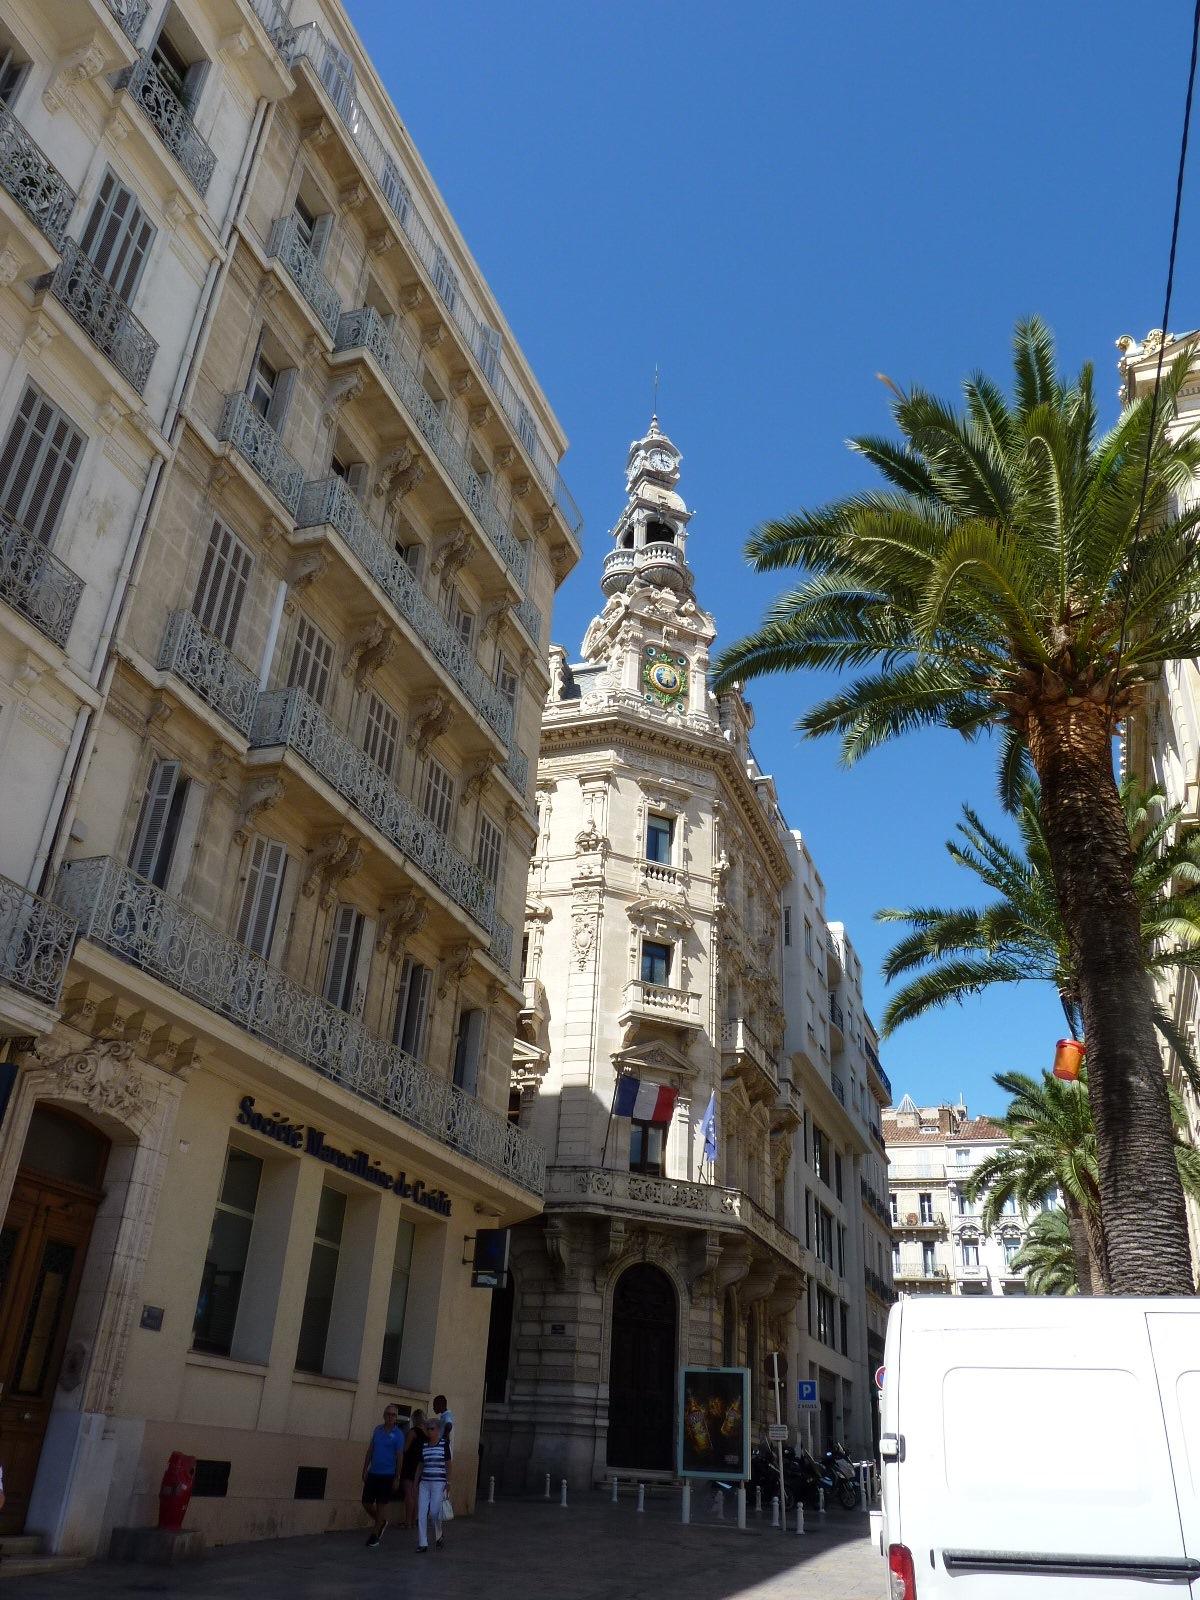 Central-Toulon.jpg